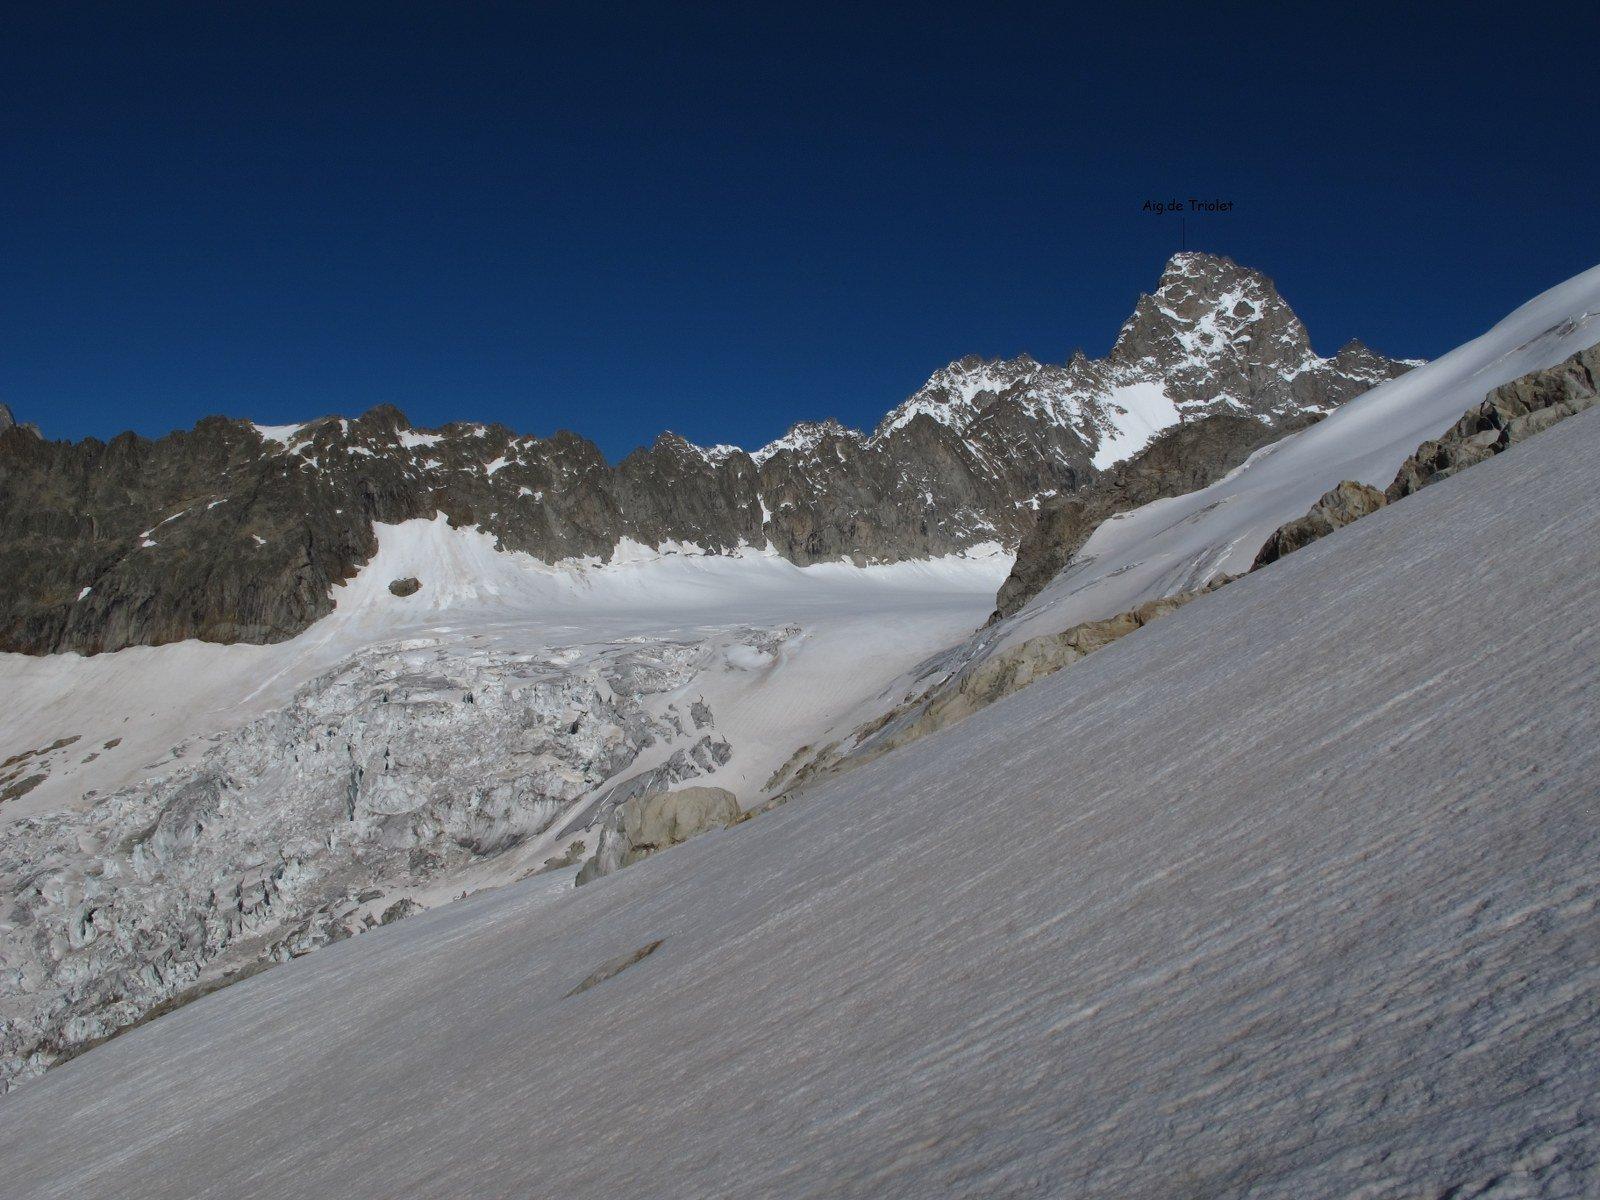 Vista sull'Aig. de Triolet